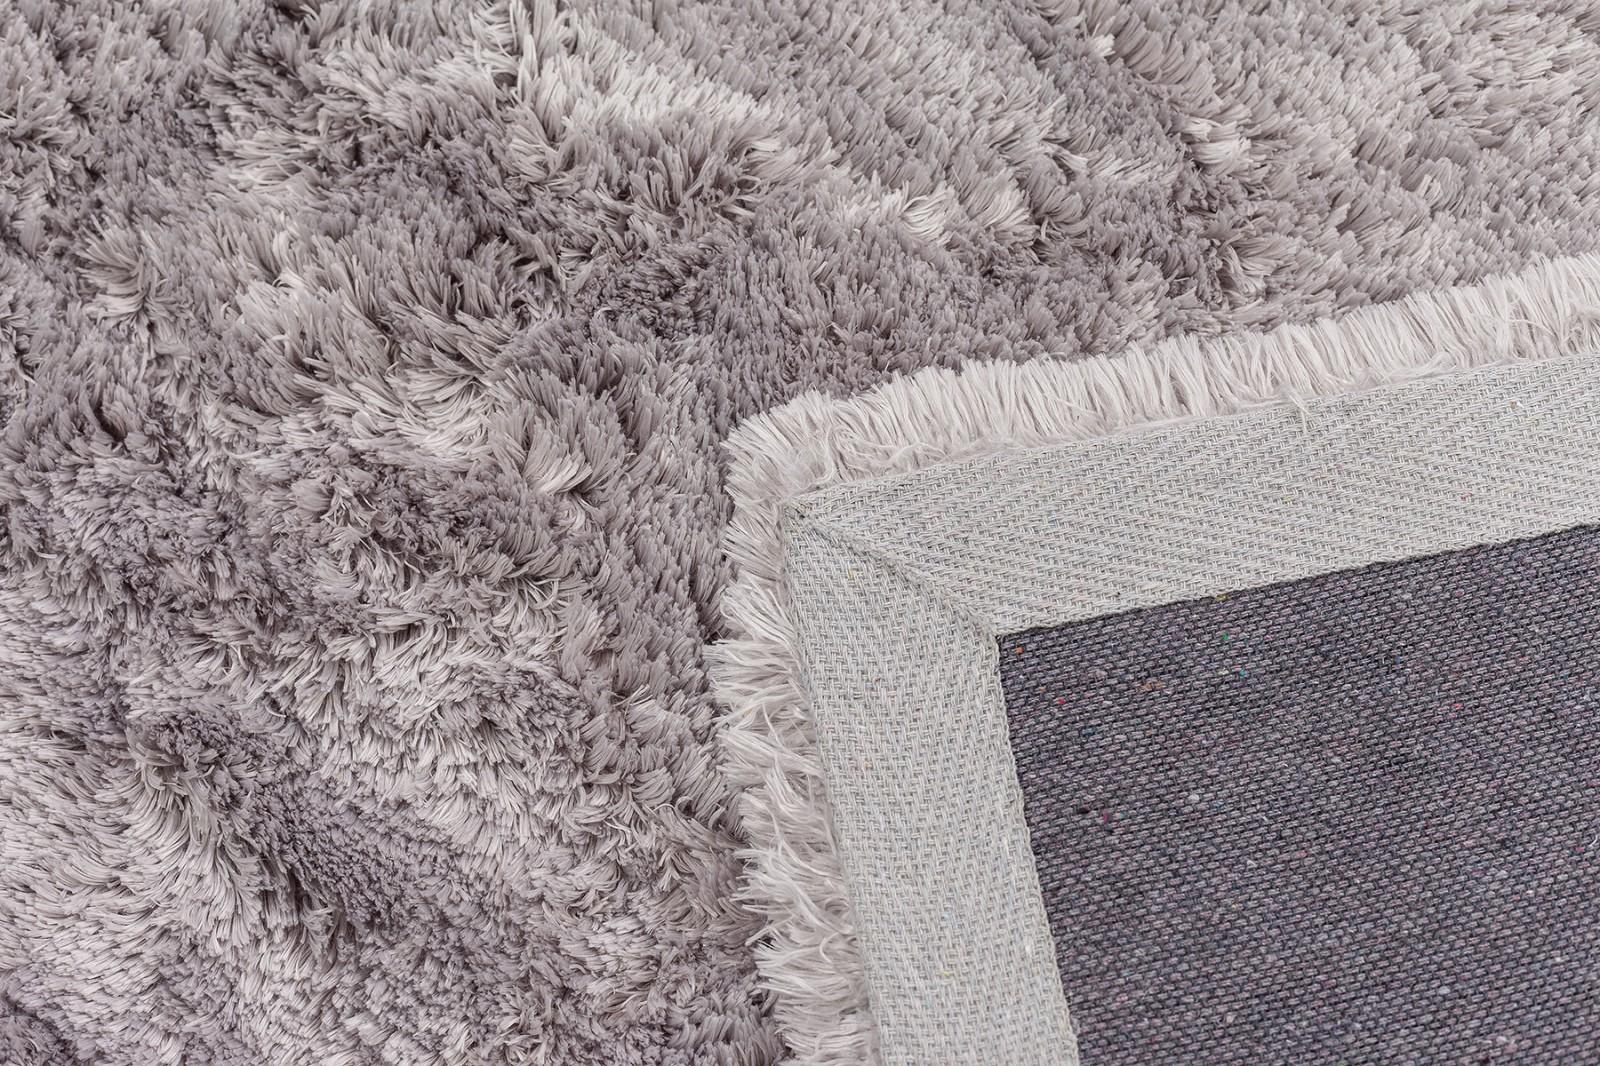 Schöner wohnen teppich  Schöner Wohnen Teppich Langflor Harmony grau 160004